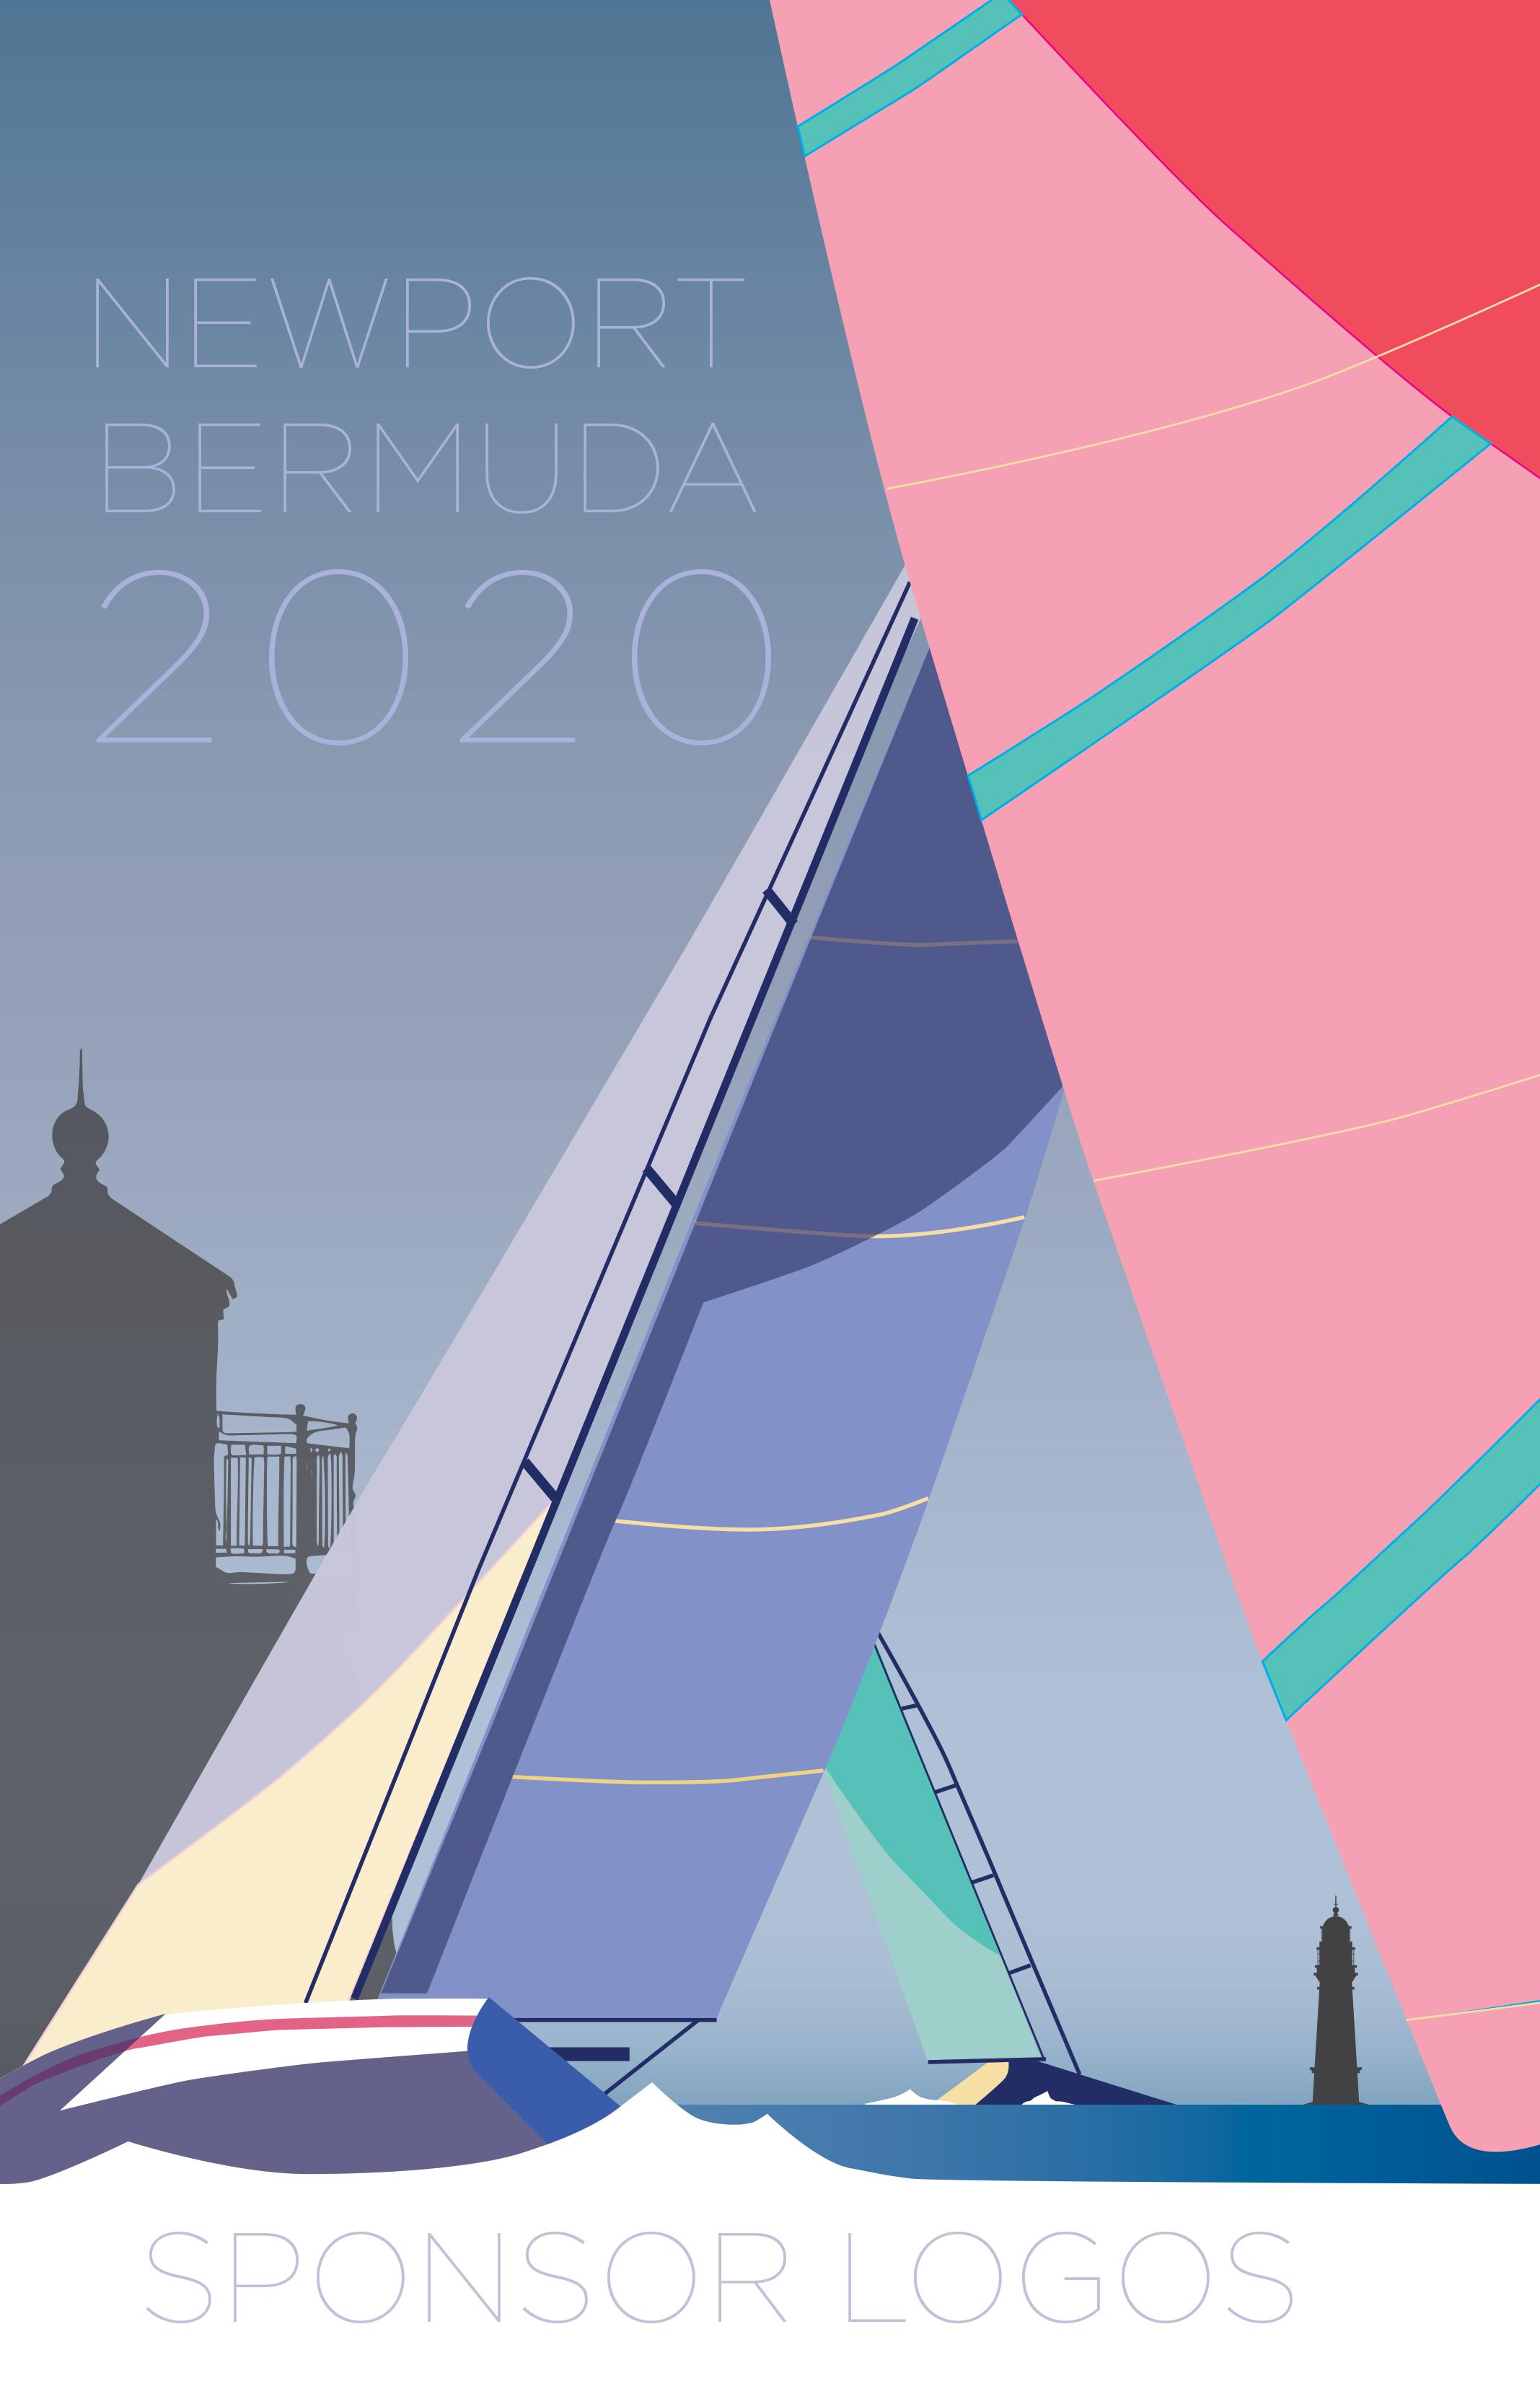 Newport Bermuda 2020